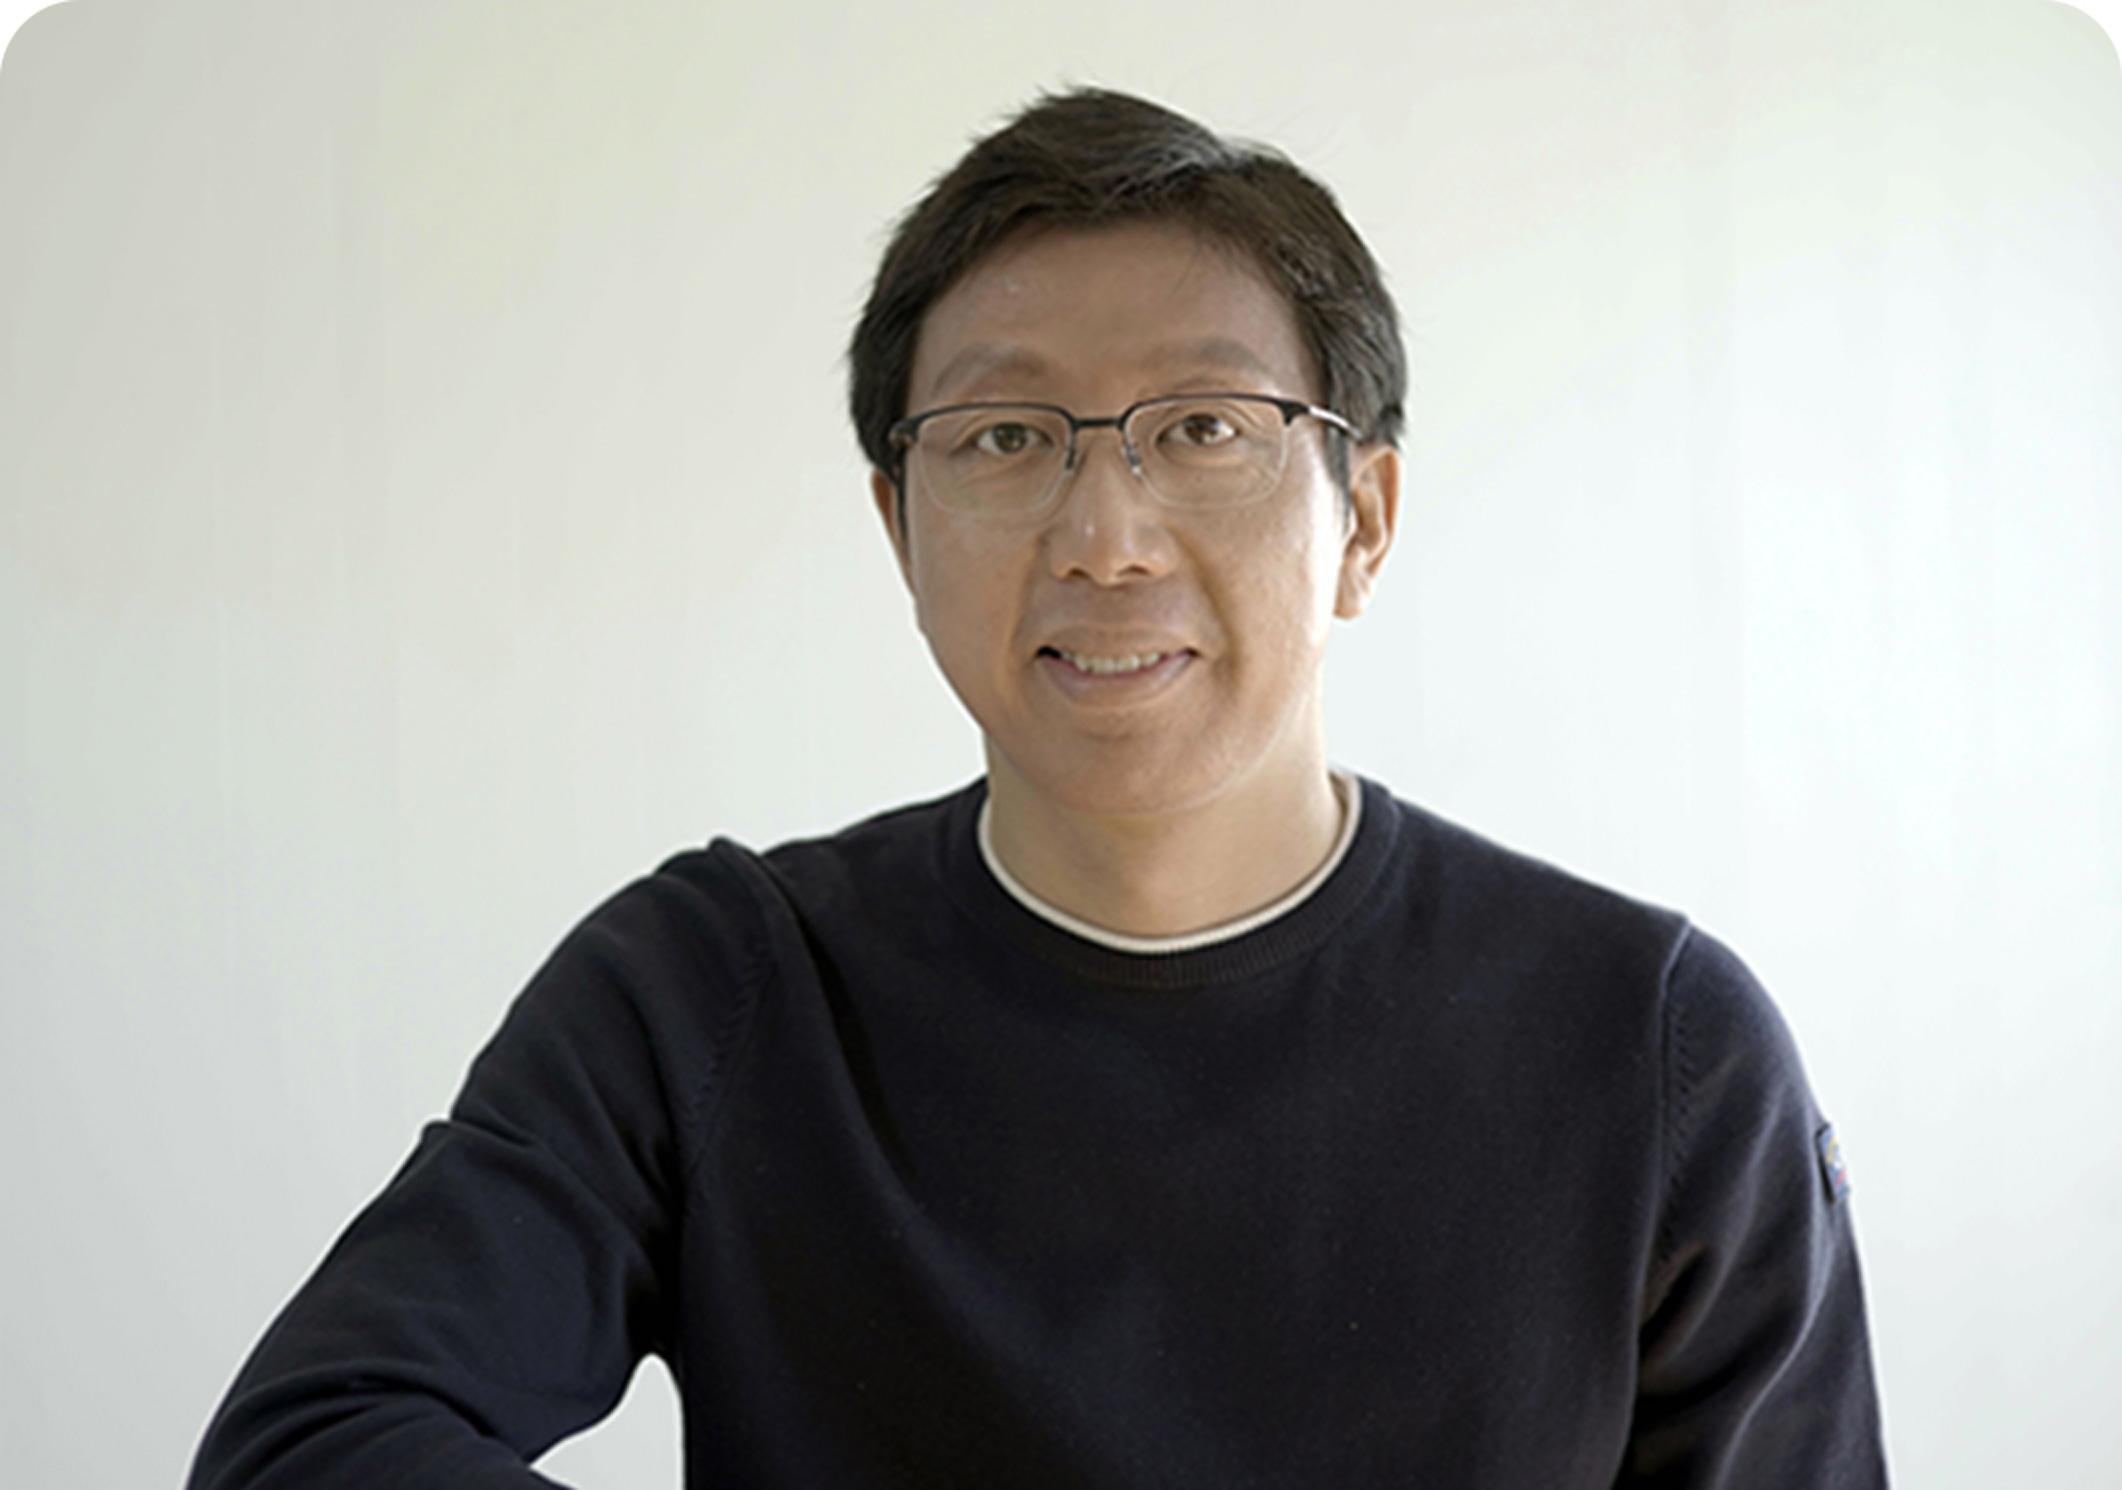 Lyon Wong, Co-Founder & CEO of the Blameless SRE Platform.